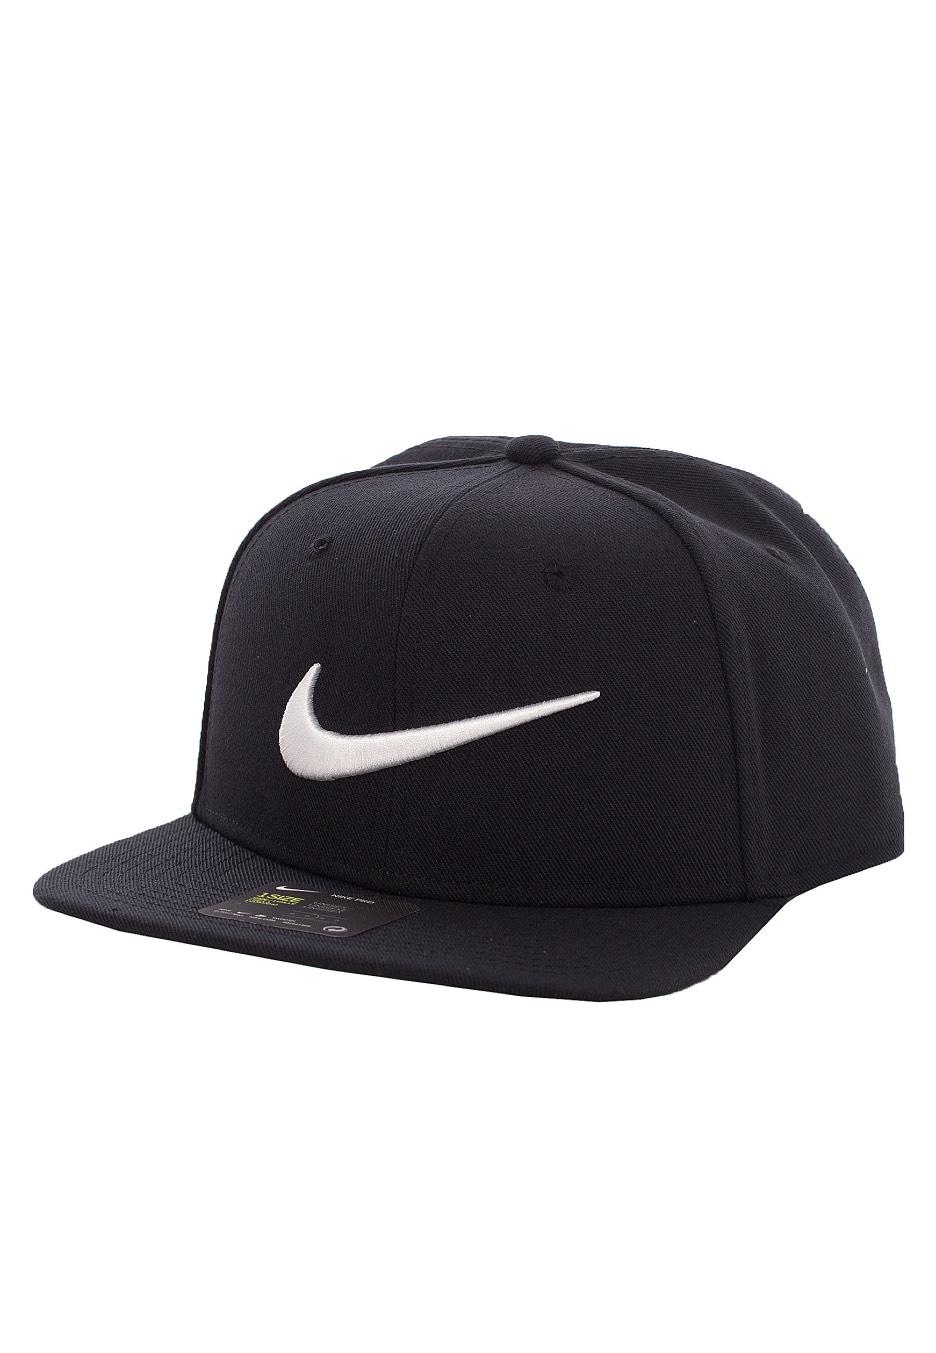 cfa35ea70c3 Nike - Swoosh Pro Black Pine Green Black white - Cap - Streetwear Shop -  Impericon.com Worldwide